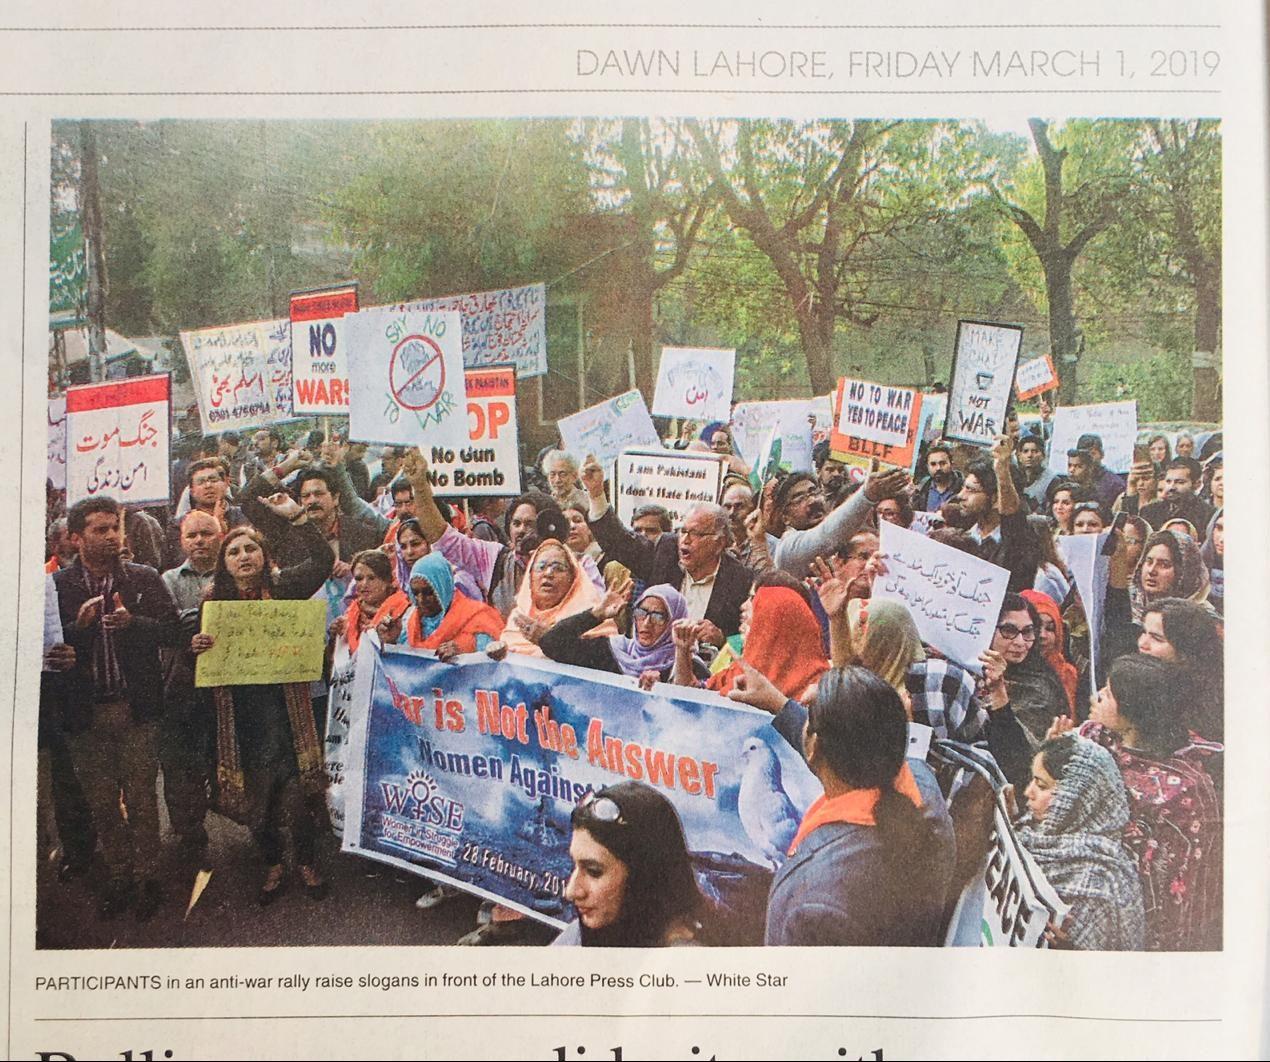 India, Pakistan #SayNoToWar: Global StandOut for Peace in